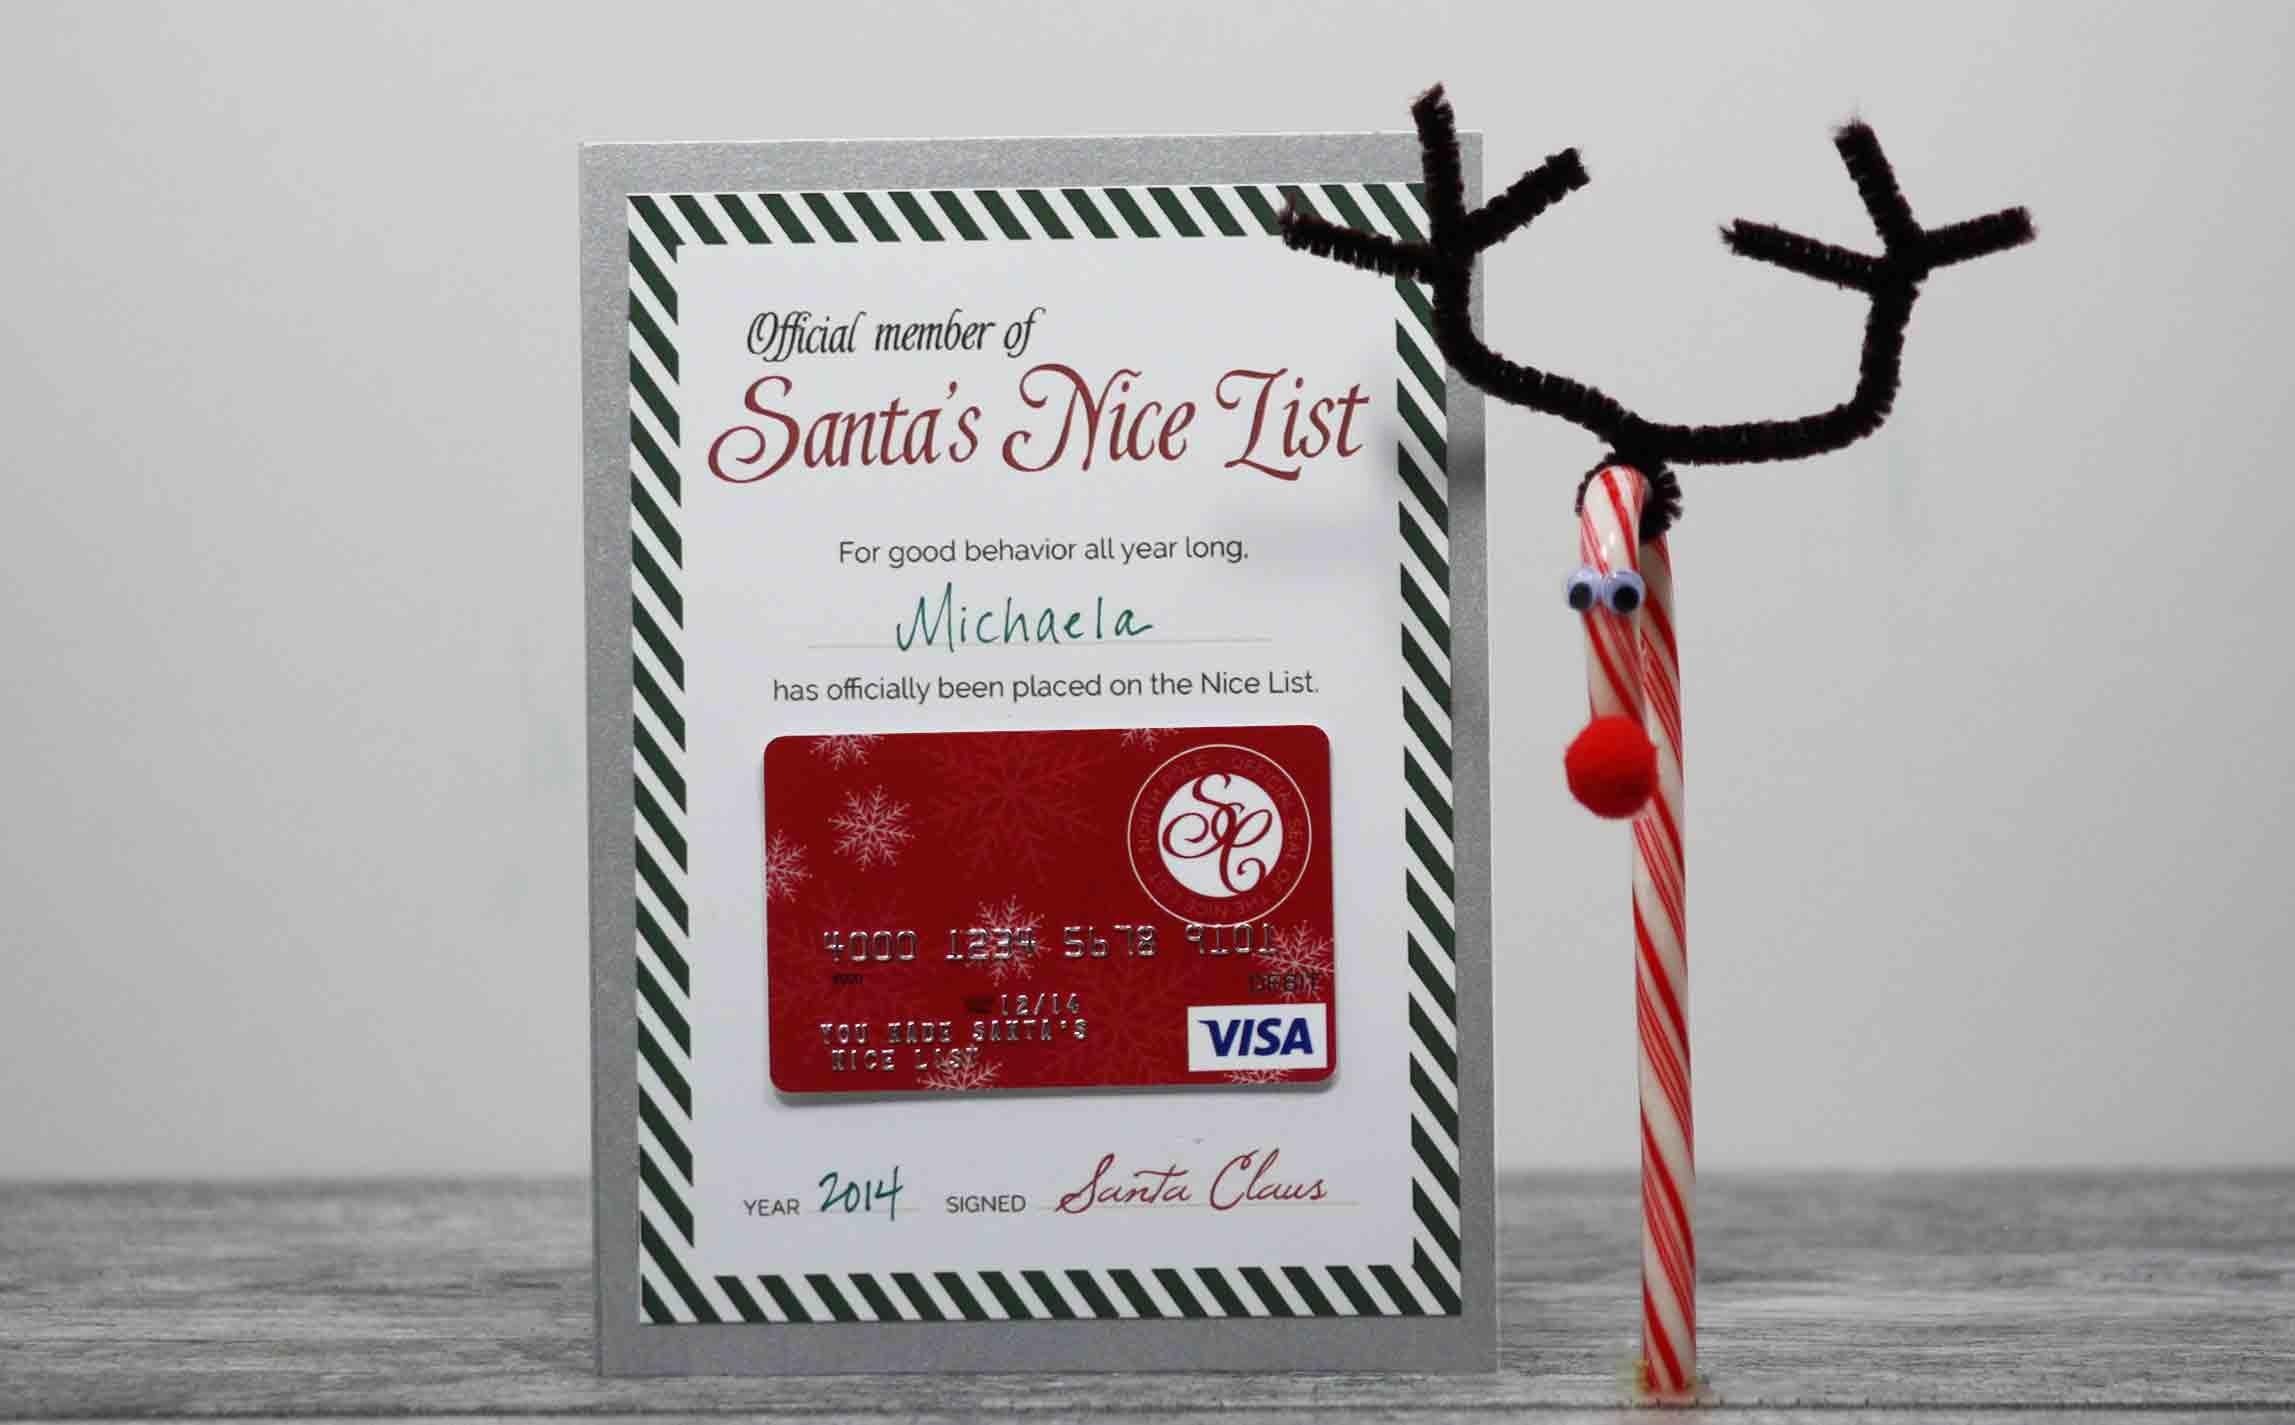 Free Printable} Santa's Nice List Certificate | Gcg - Free Printable Xmas Gift Certificates